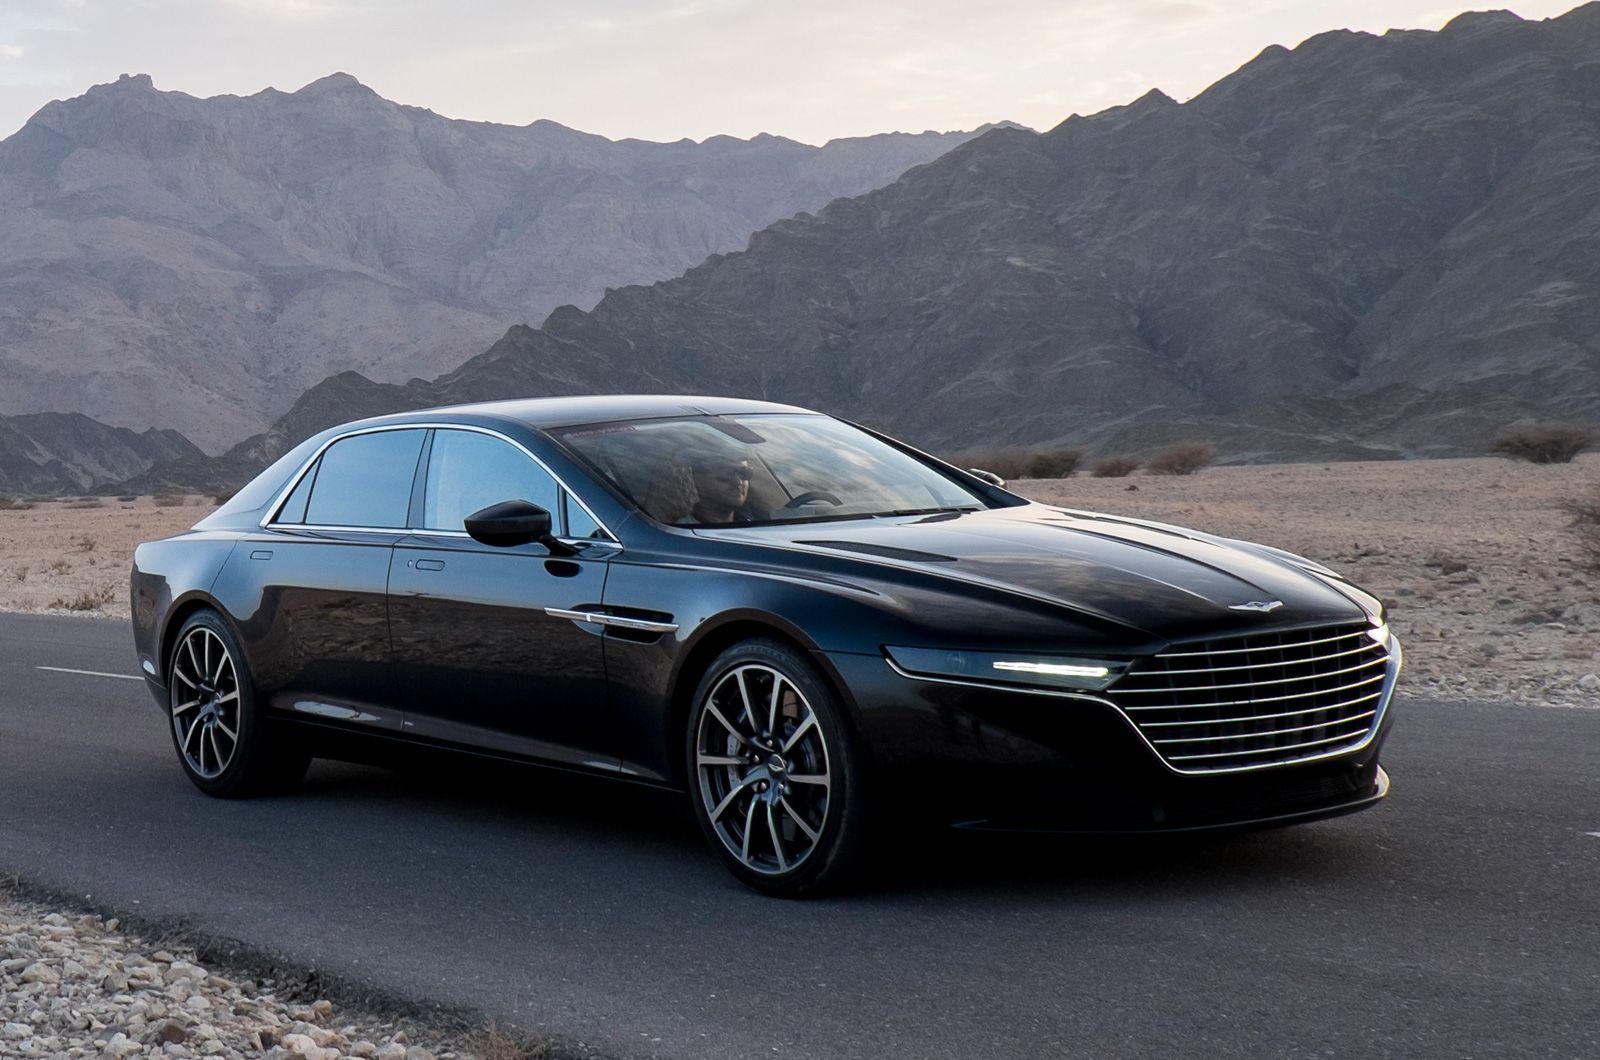 Aston Martin Drops New Photos Of Lagonda Saloon Carscoops Aston Martin Lagonda Aston Martin Cars Aston Martin